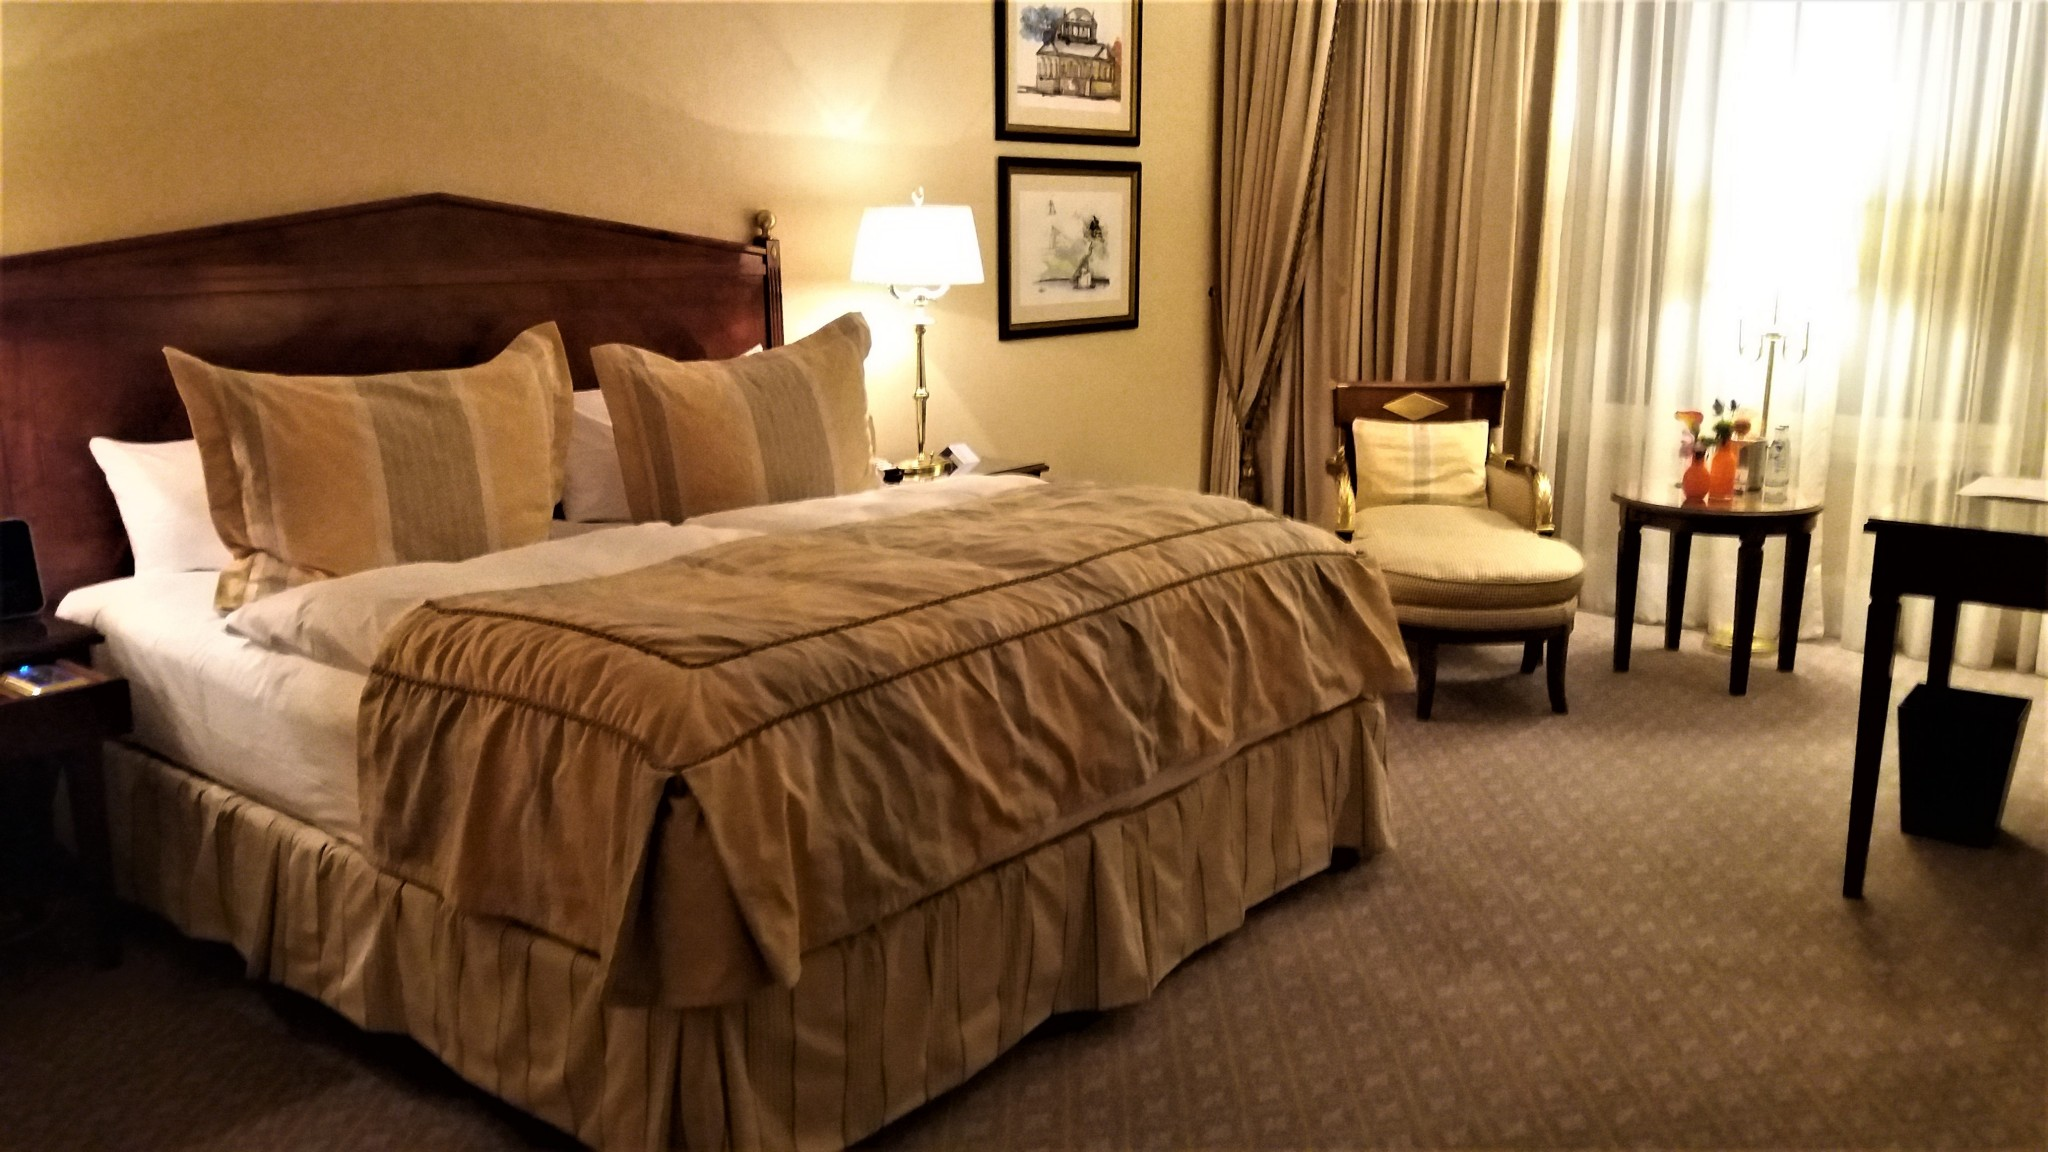 berliini kohtuuhintaisten luksushotellien kaupunki passionate traveller. Black Bedroom Furniture Sets. Home Design Ideas